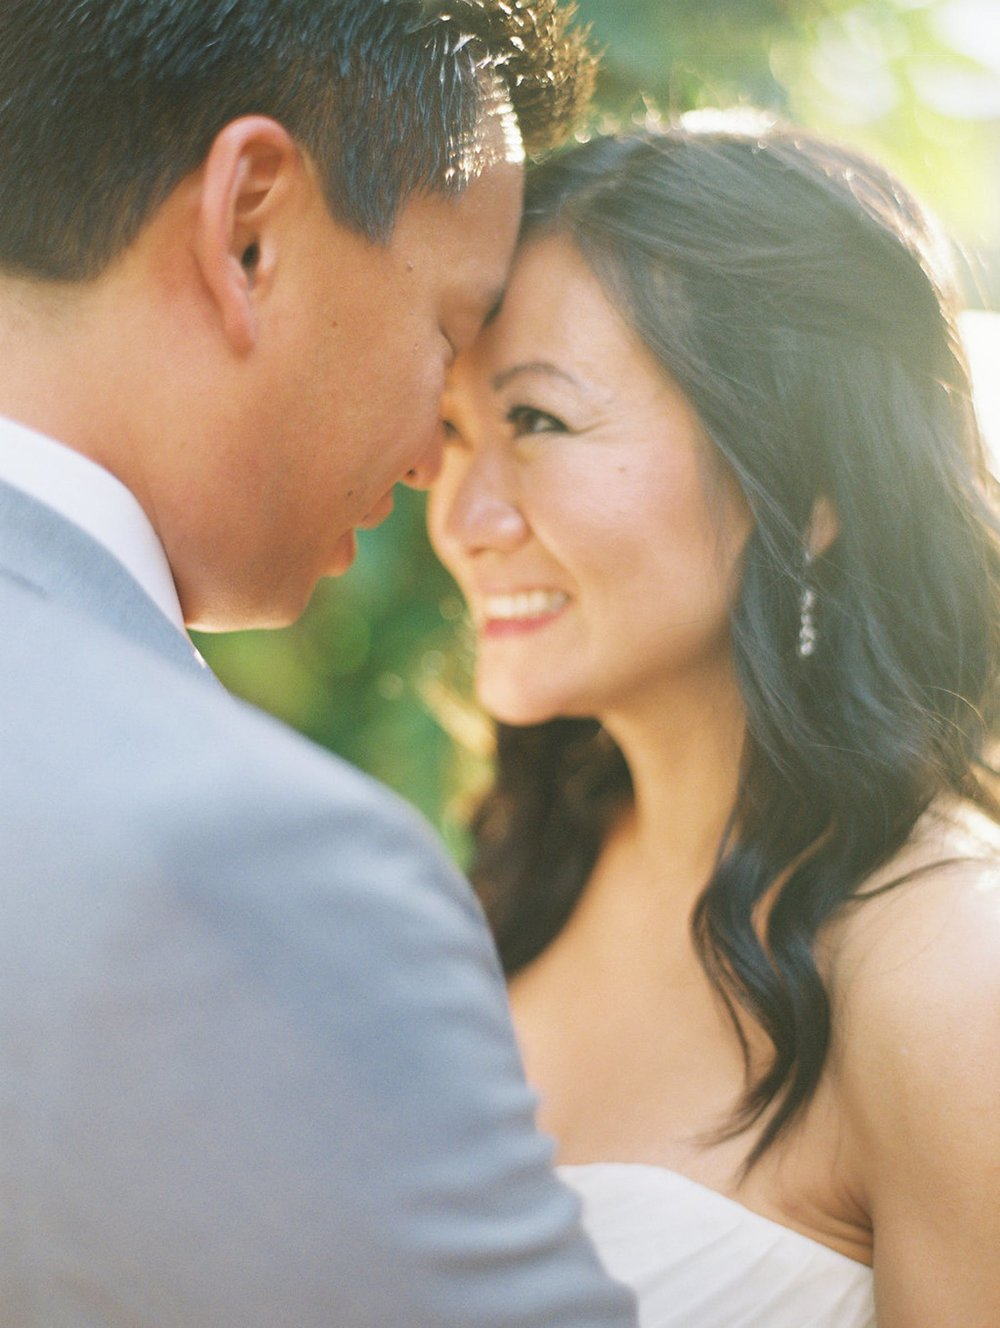 www.santabarbarawedding.com | El Encanto | Coco Rose Design | This Modern Romance | Bride and Groom